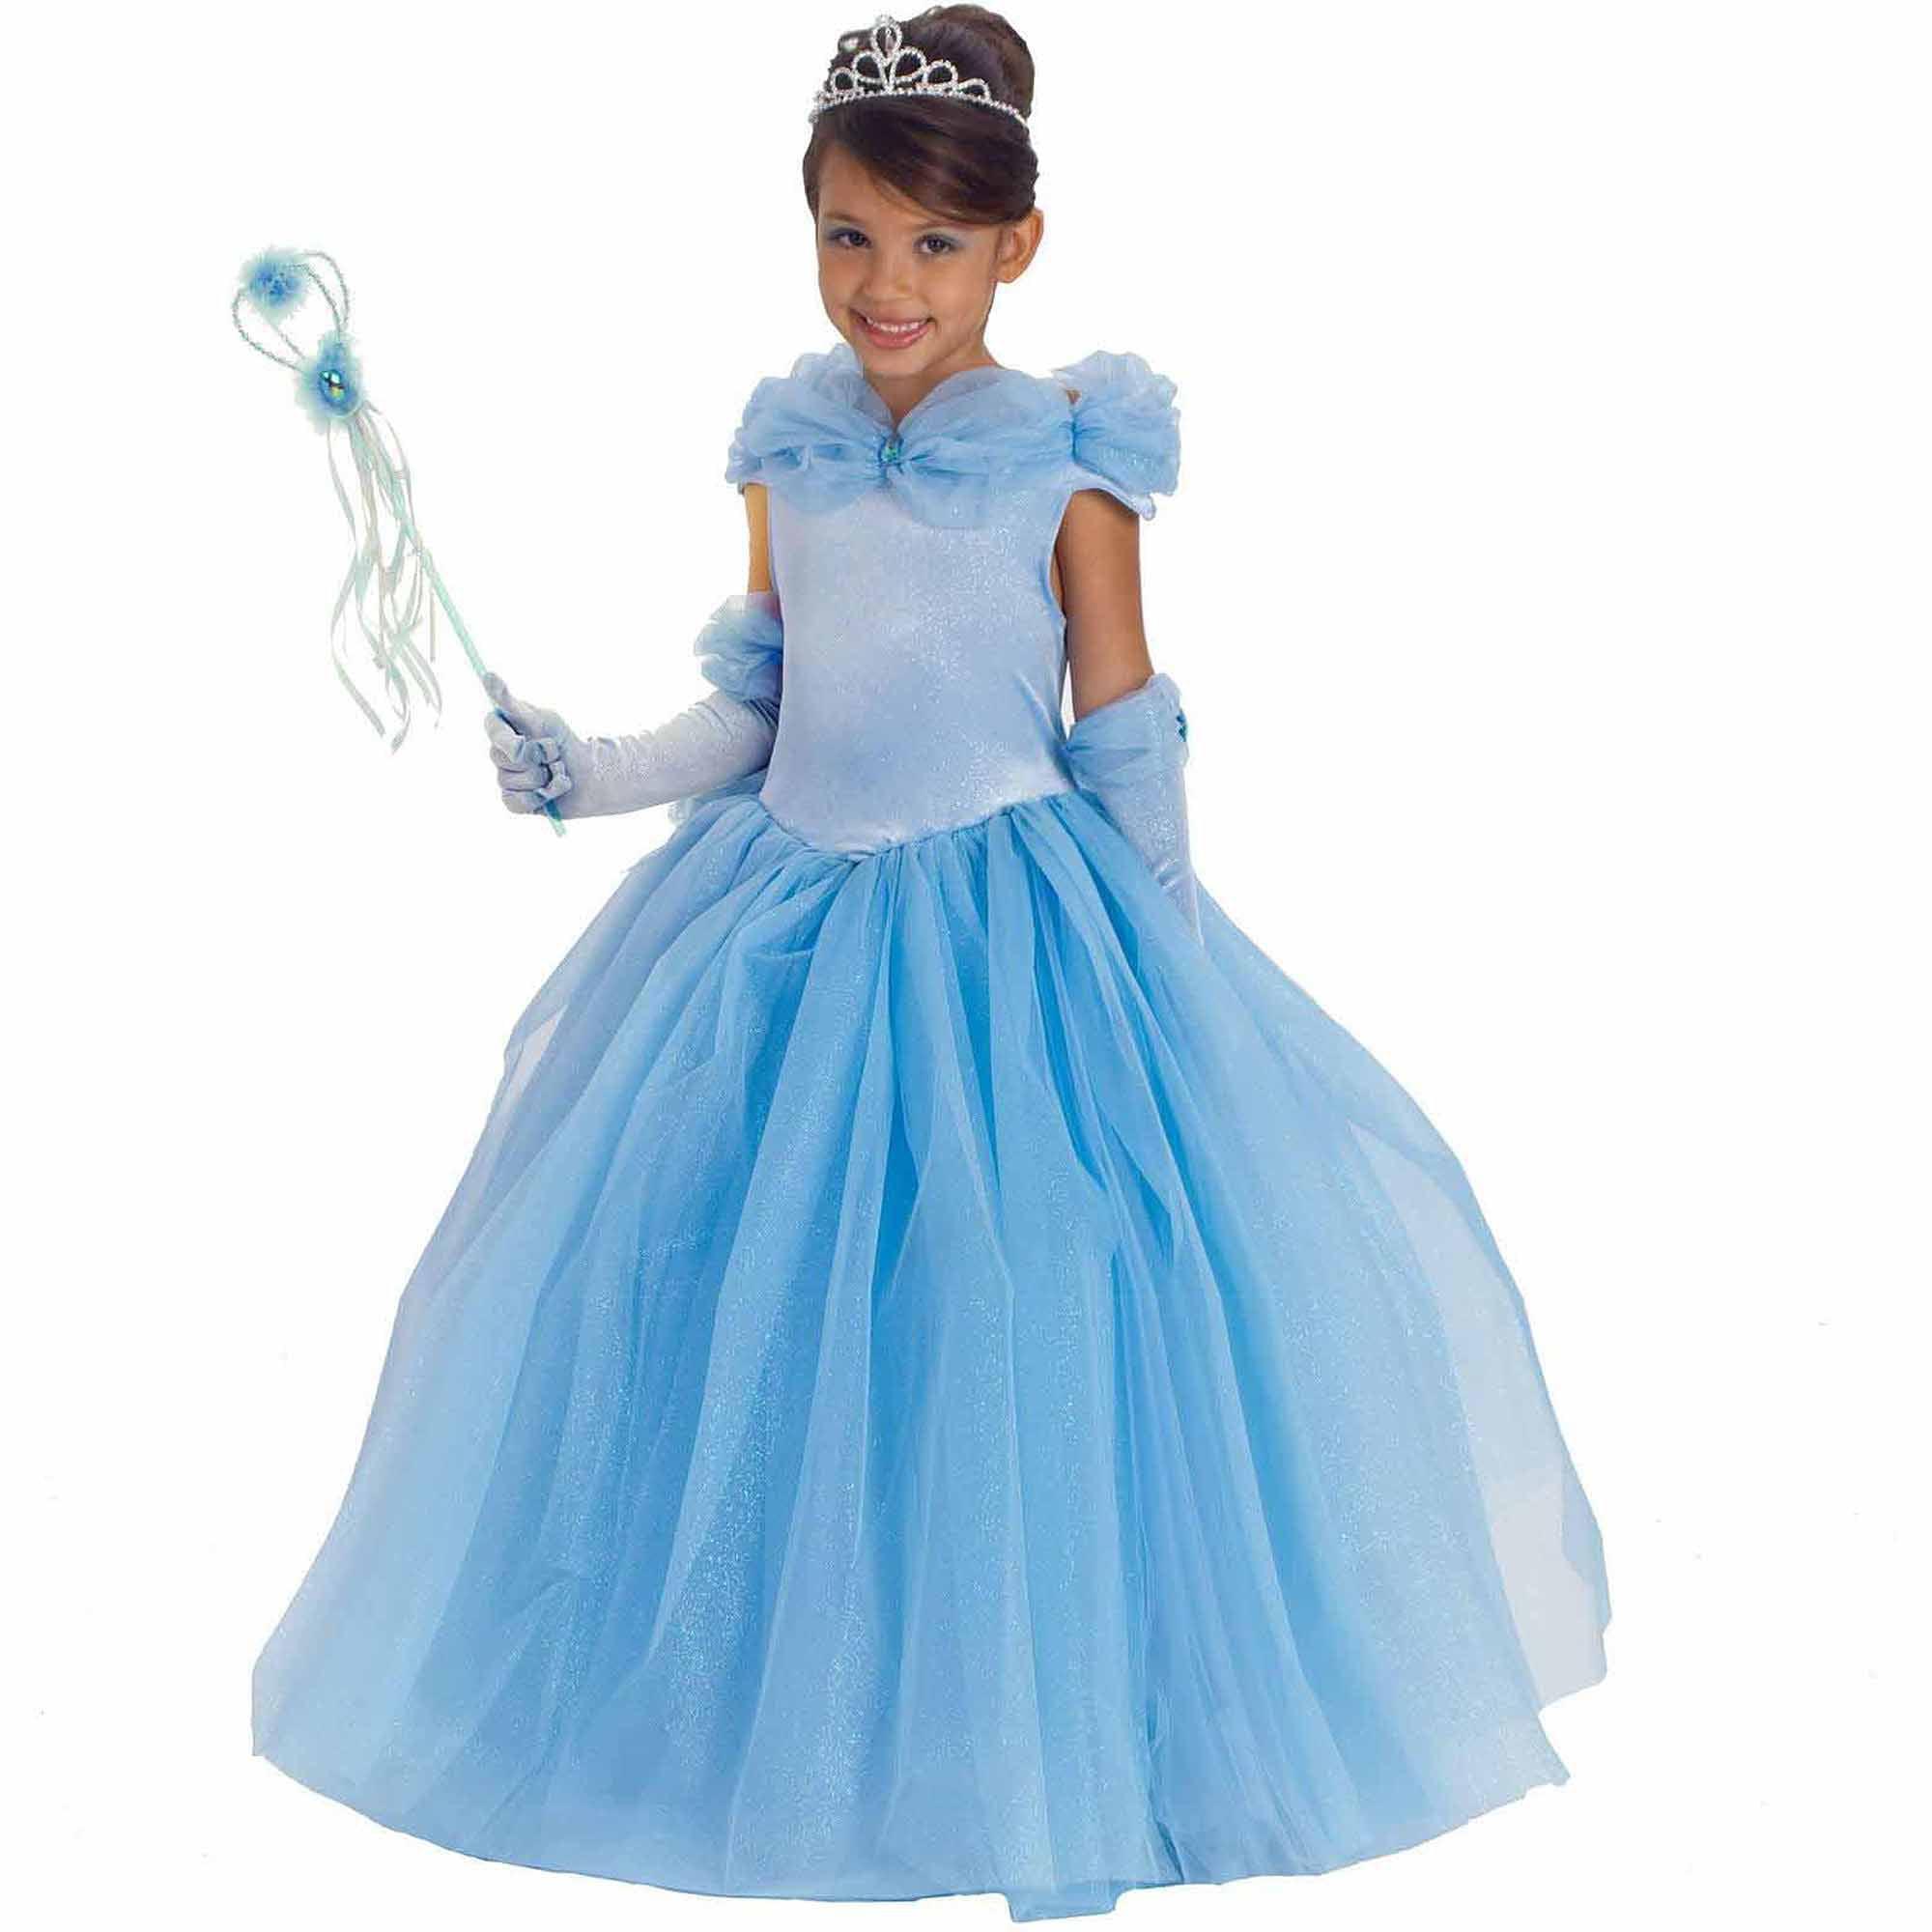 Blue Princess Cynthia Child Halloween Costume